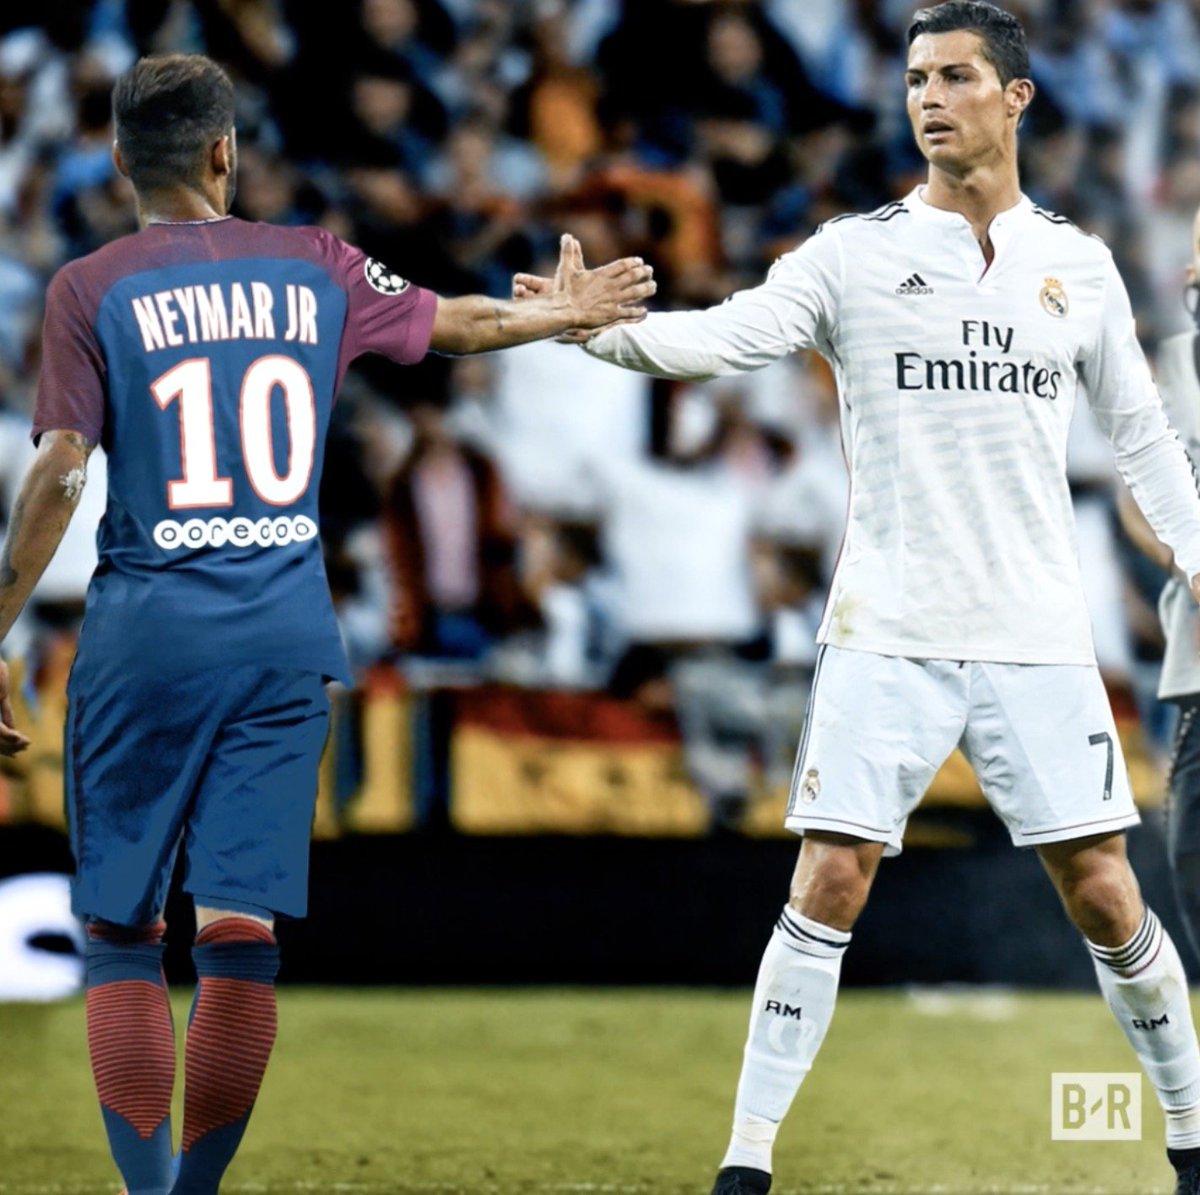 Neymar. Ronaldo. New look, same classic showdown. https://t.co/e07Y2ArqtU